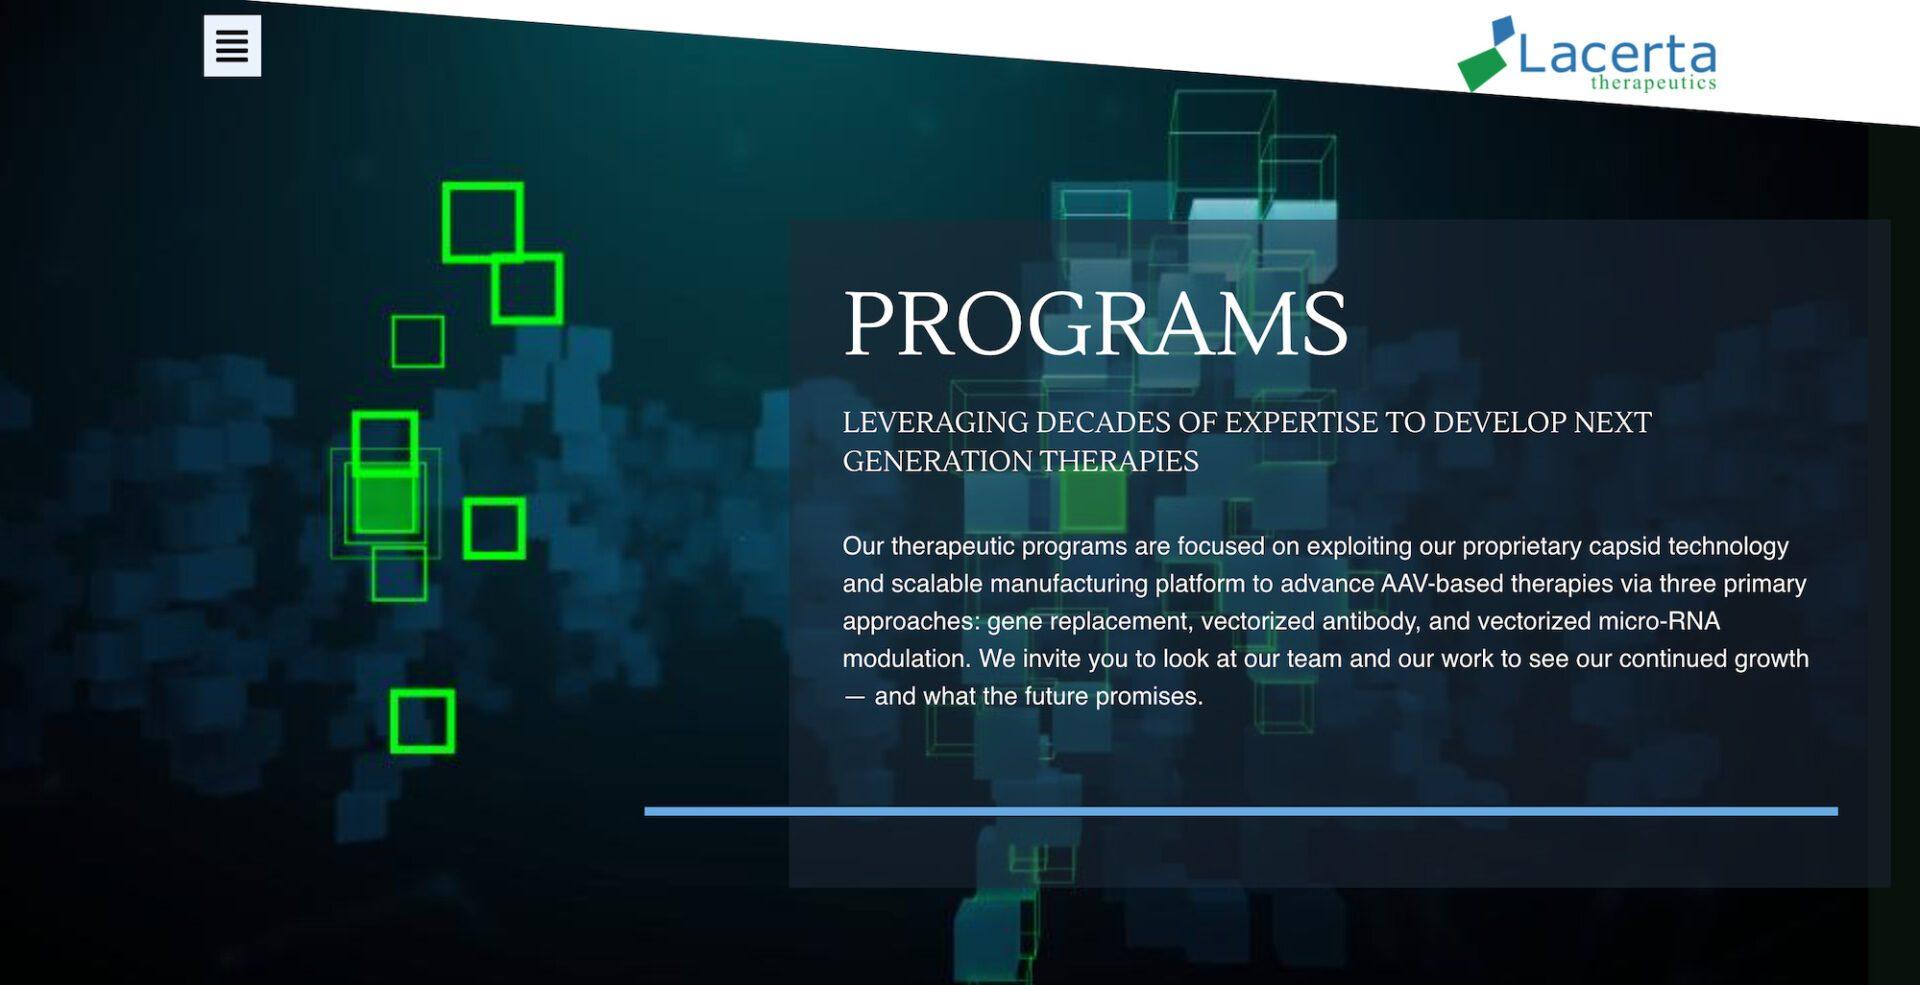 Programs-at-Lacerta-–-Lacerta-Therapeutics